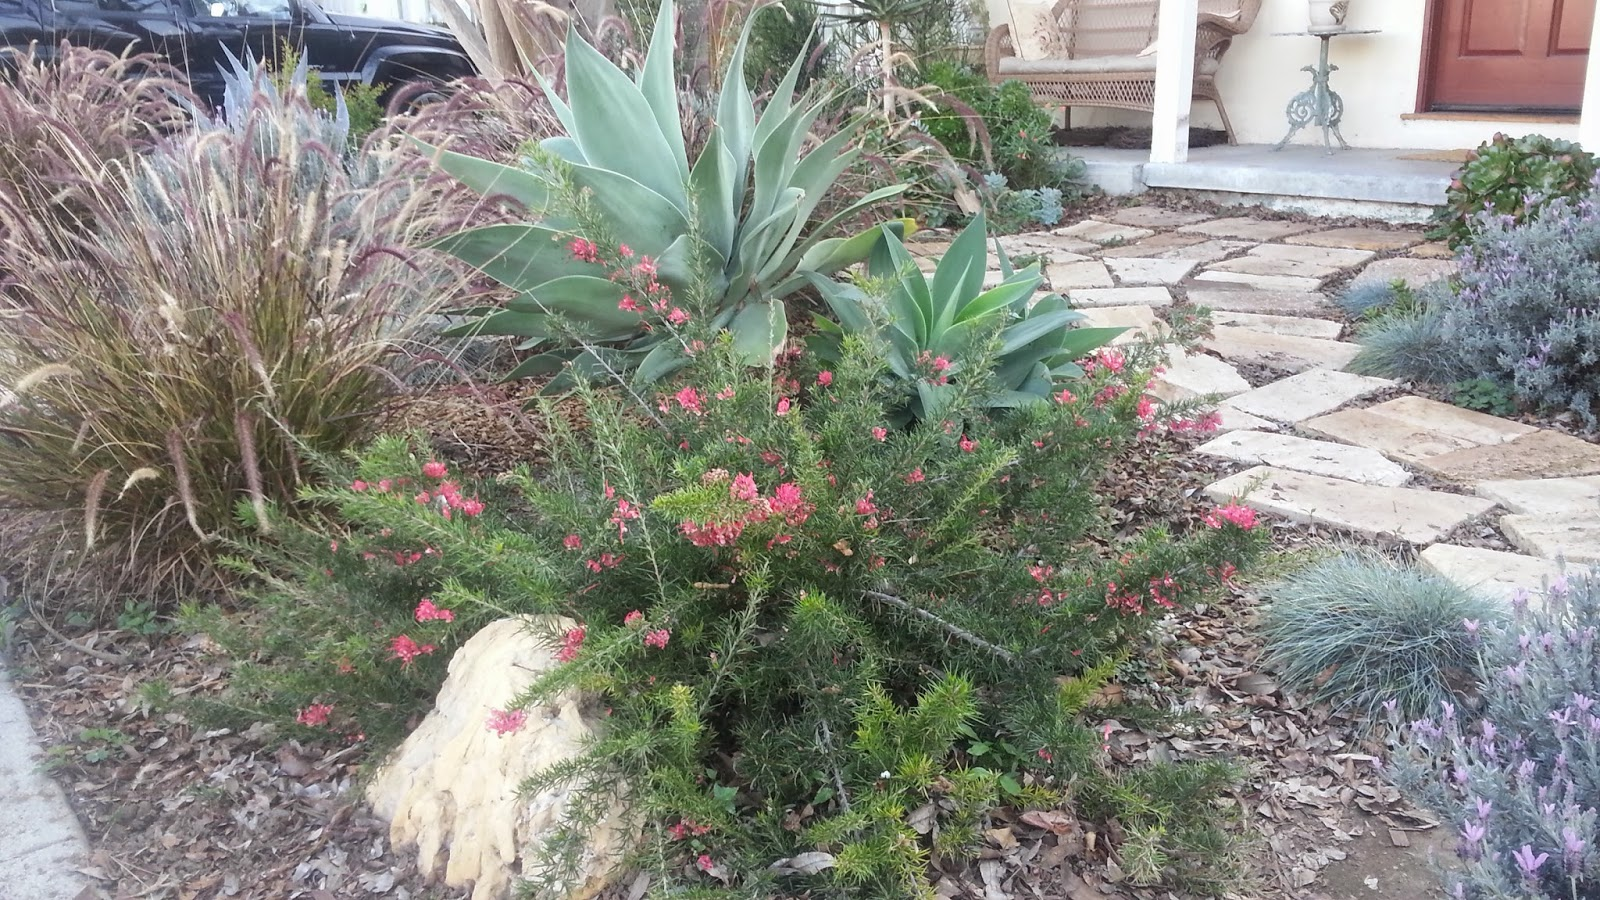 mar vista green garden showcase 3769 greenwood avenue cluster 5d